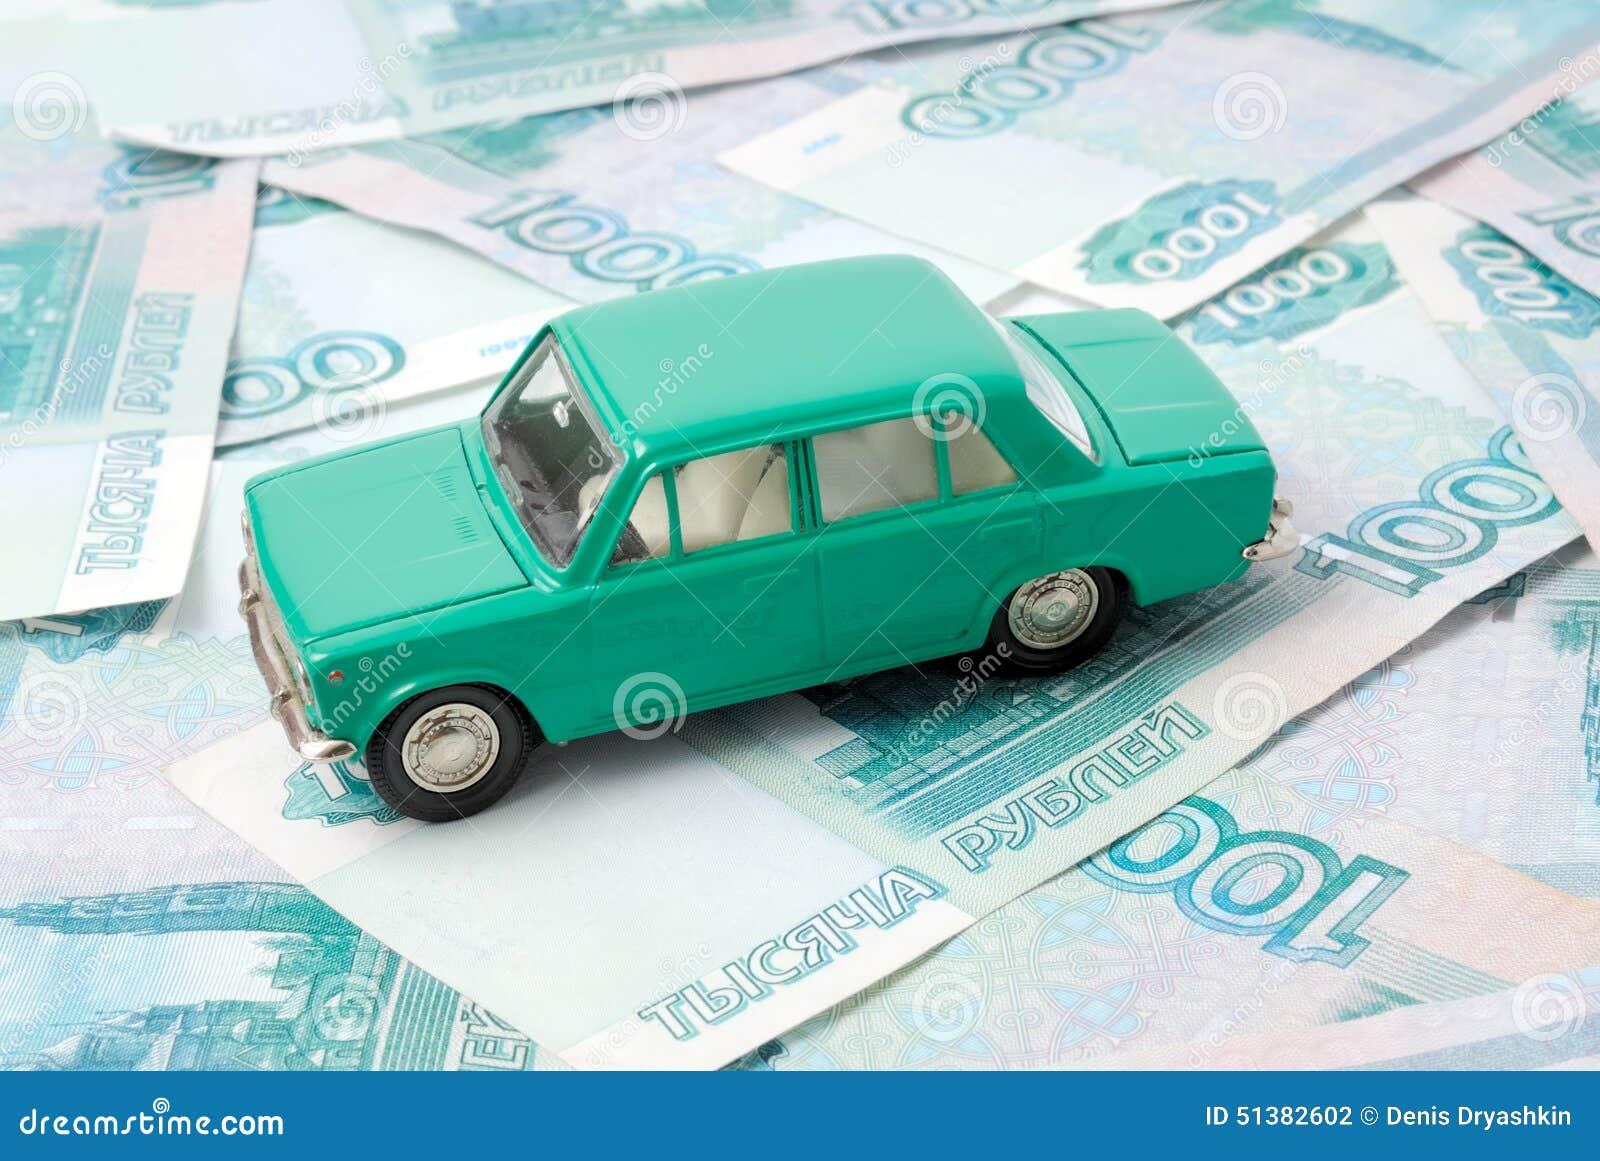 Amazing Money For Old Car Photos - Classic Cars Ideas - boiq.info